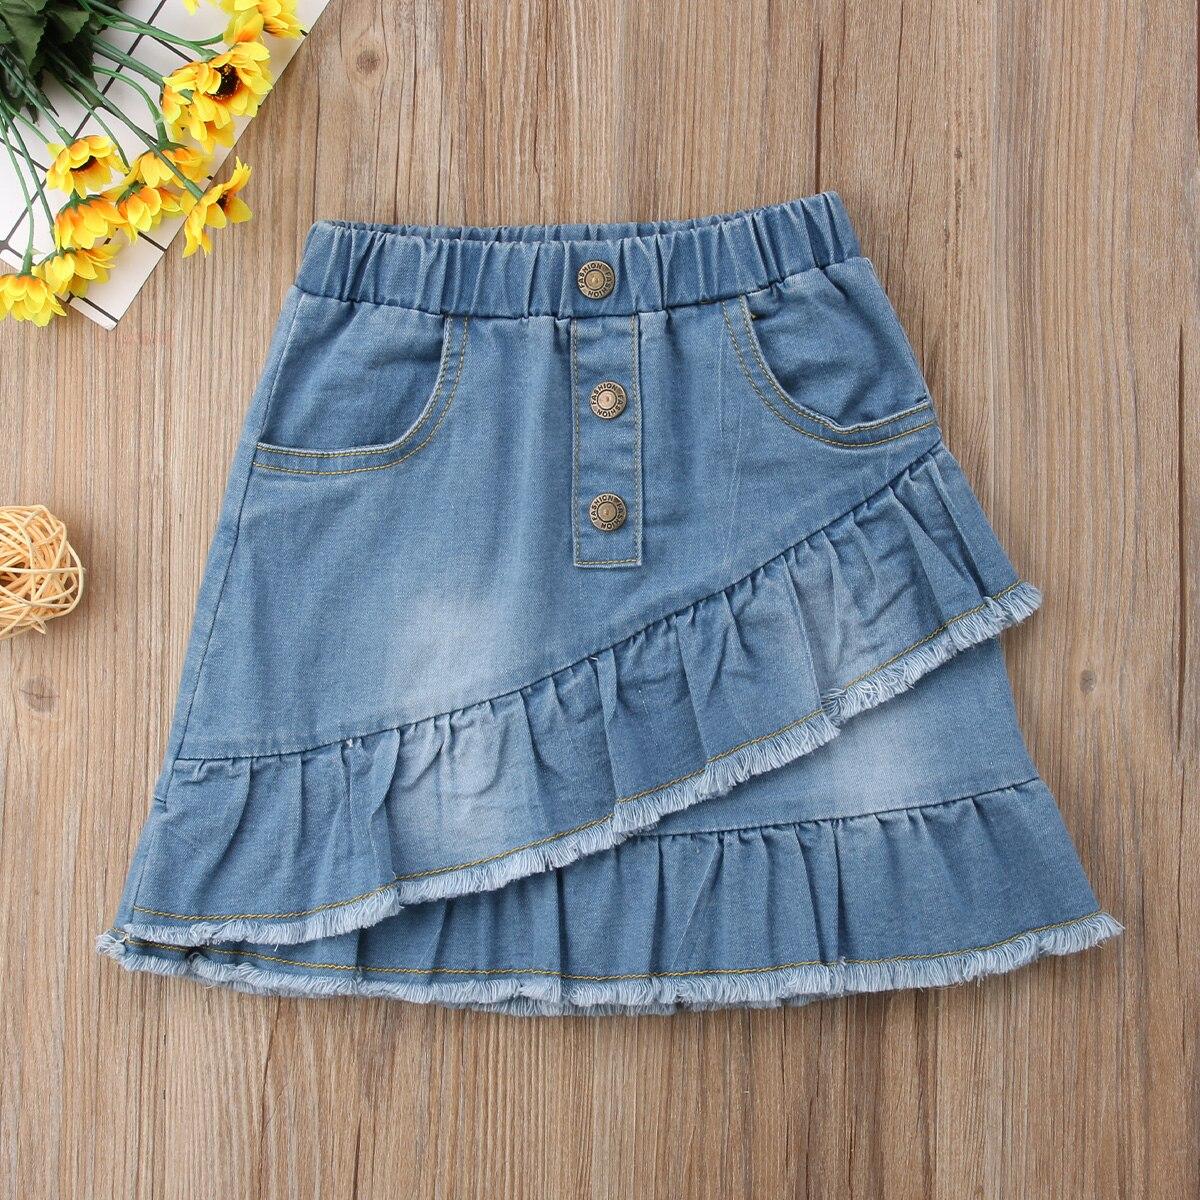 como hacer faldas de jeans viejos g1